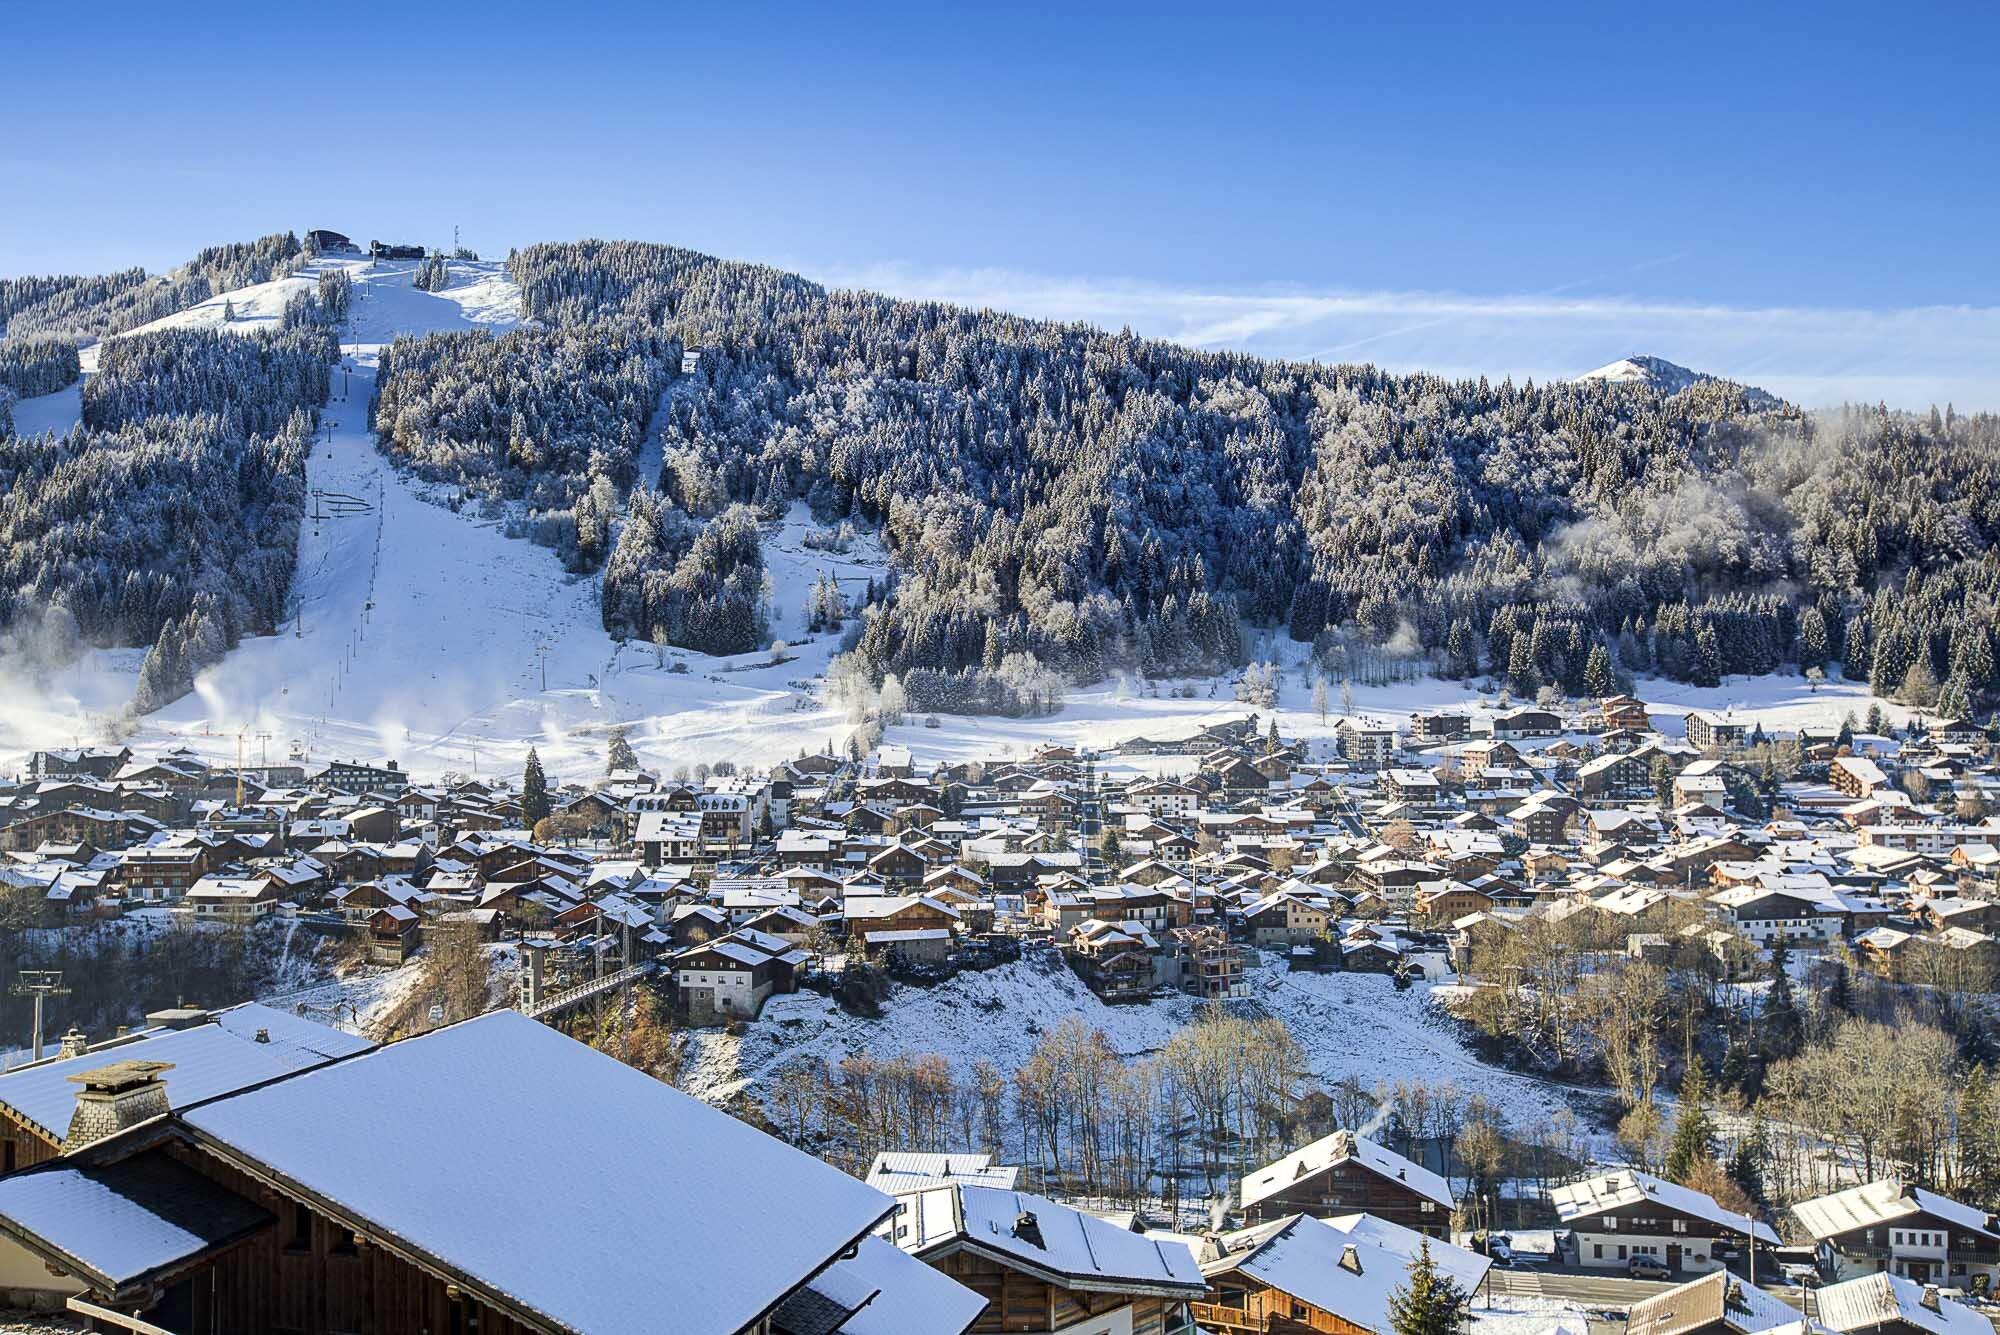 tg-ski-luxury-chalet-bouquetin-morzine-the view-002.jpg